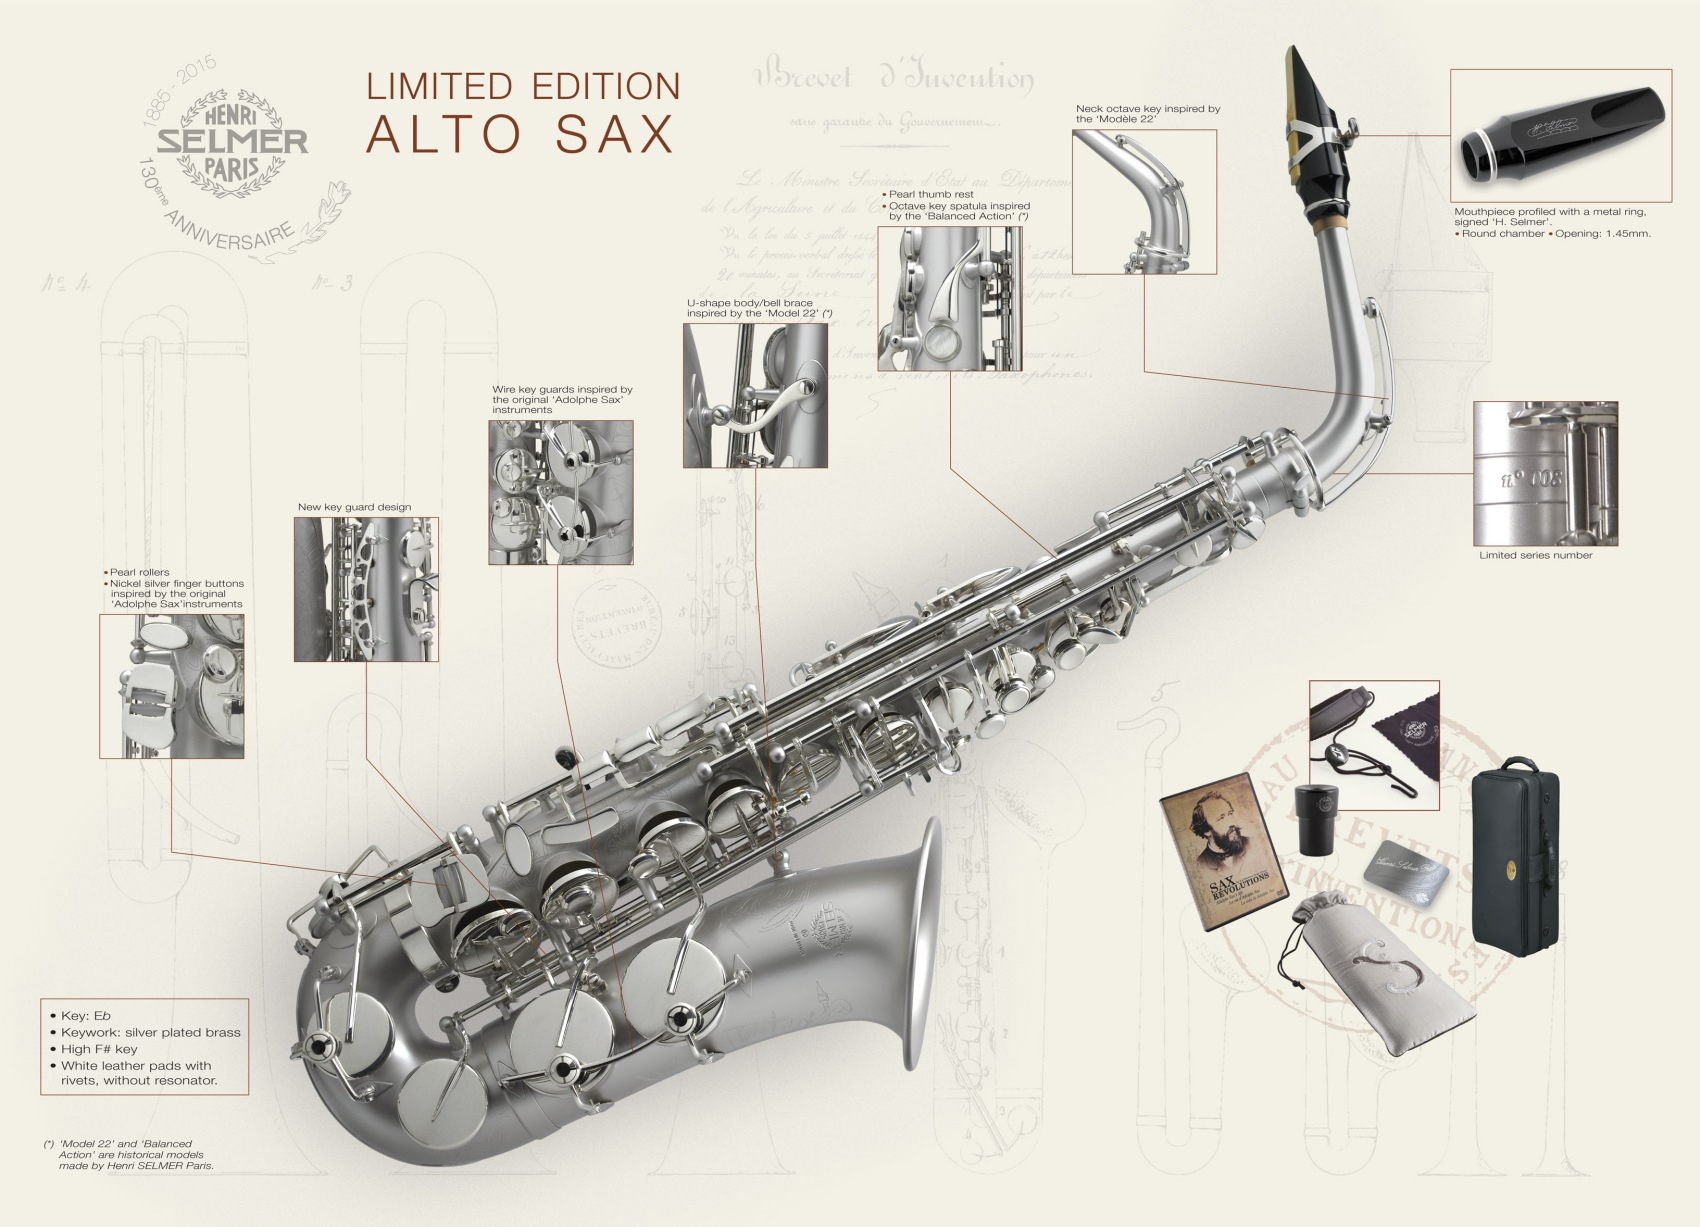 Selmer paris 130th anniversary adolpe sax tribute alto saxophone